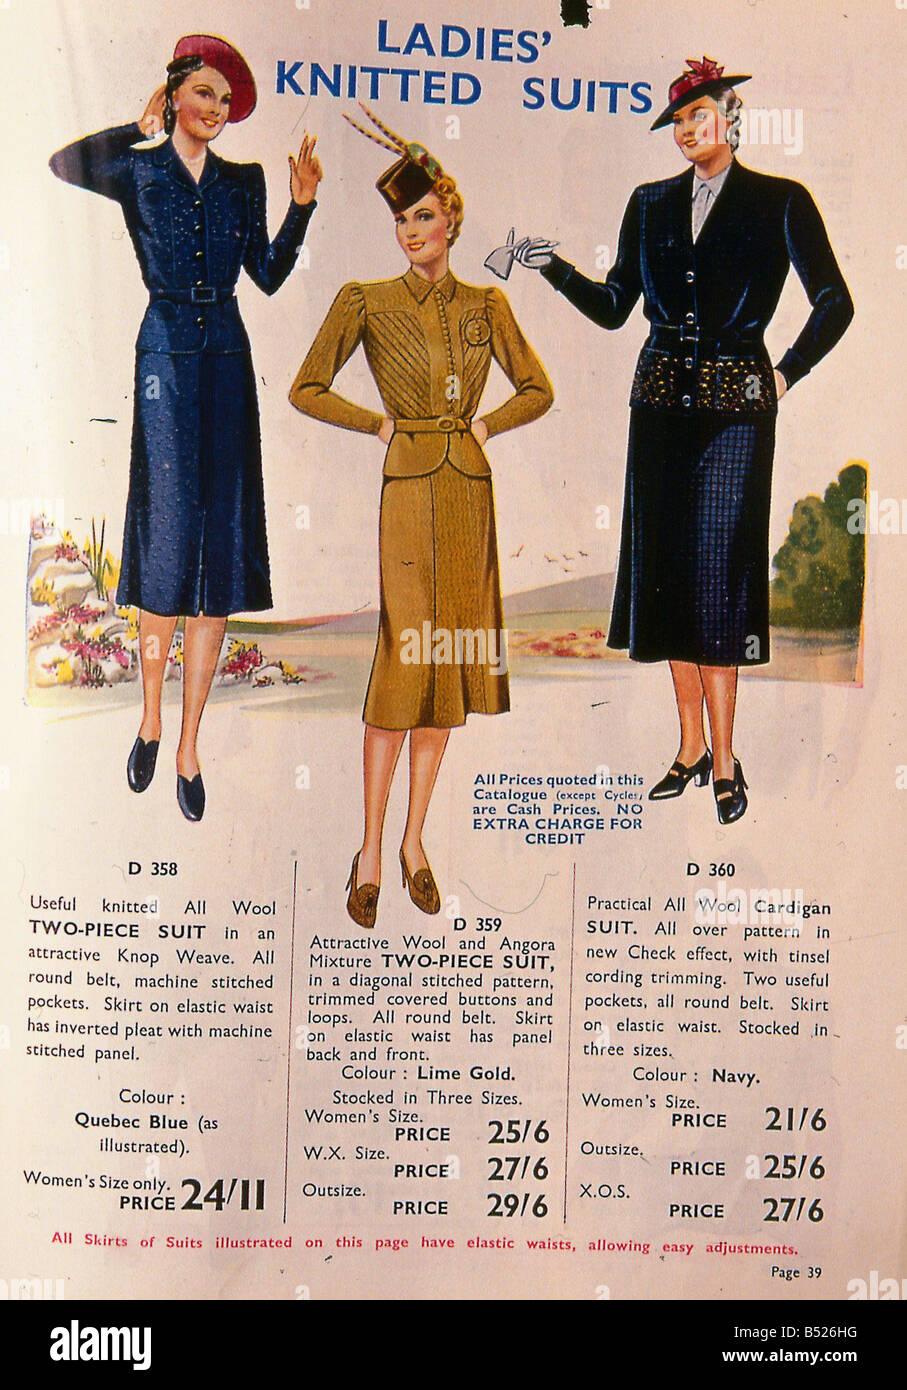 Fashion Flashback Wwii Women S Fashion: World War II Fashion 1939 Womens Knitted Suits Stock Photo